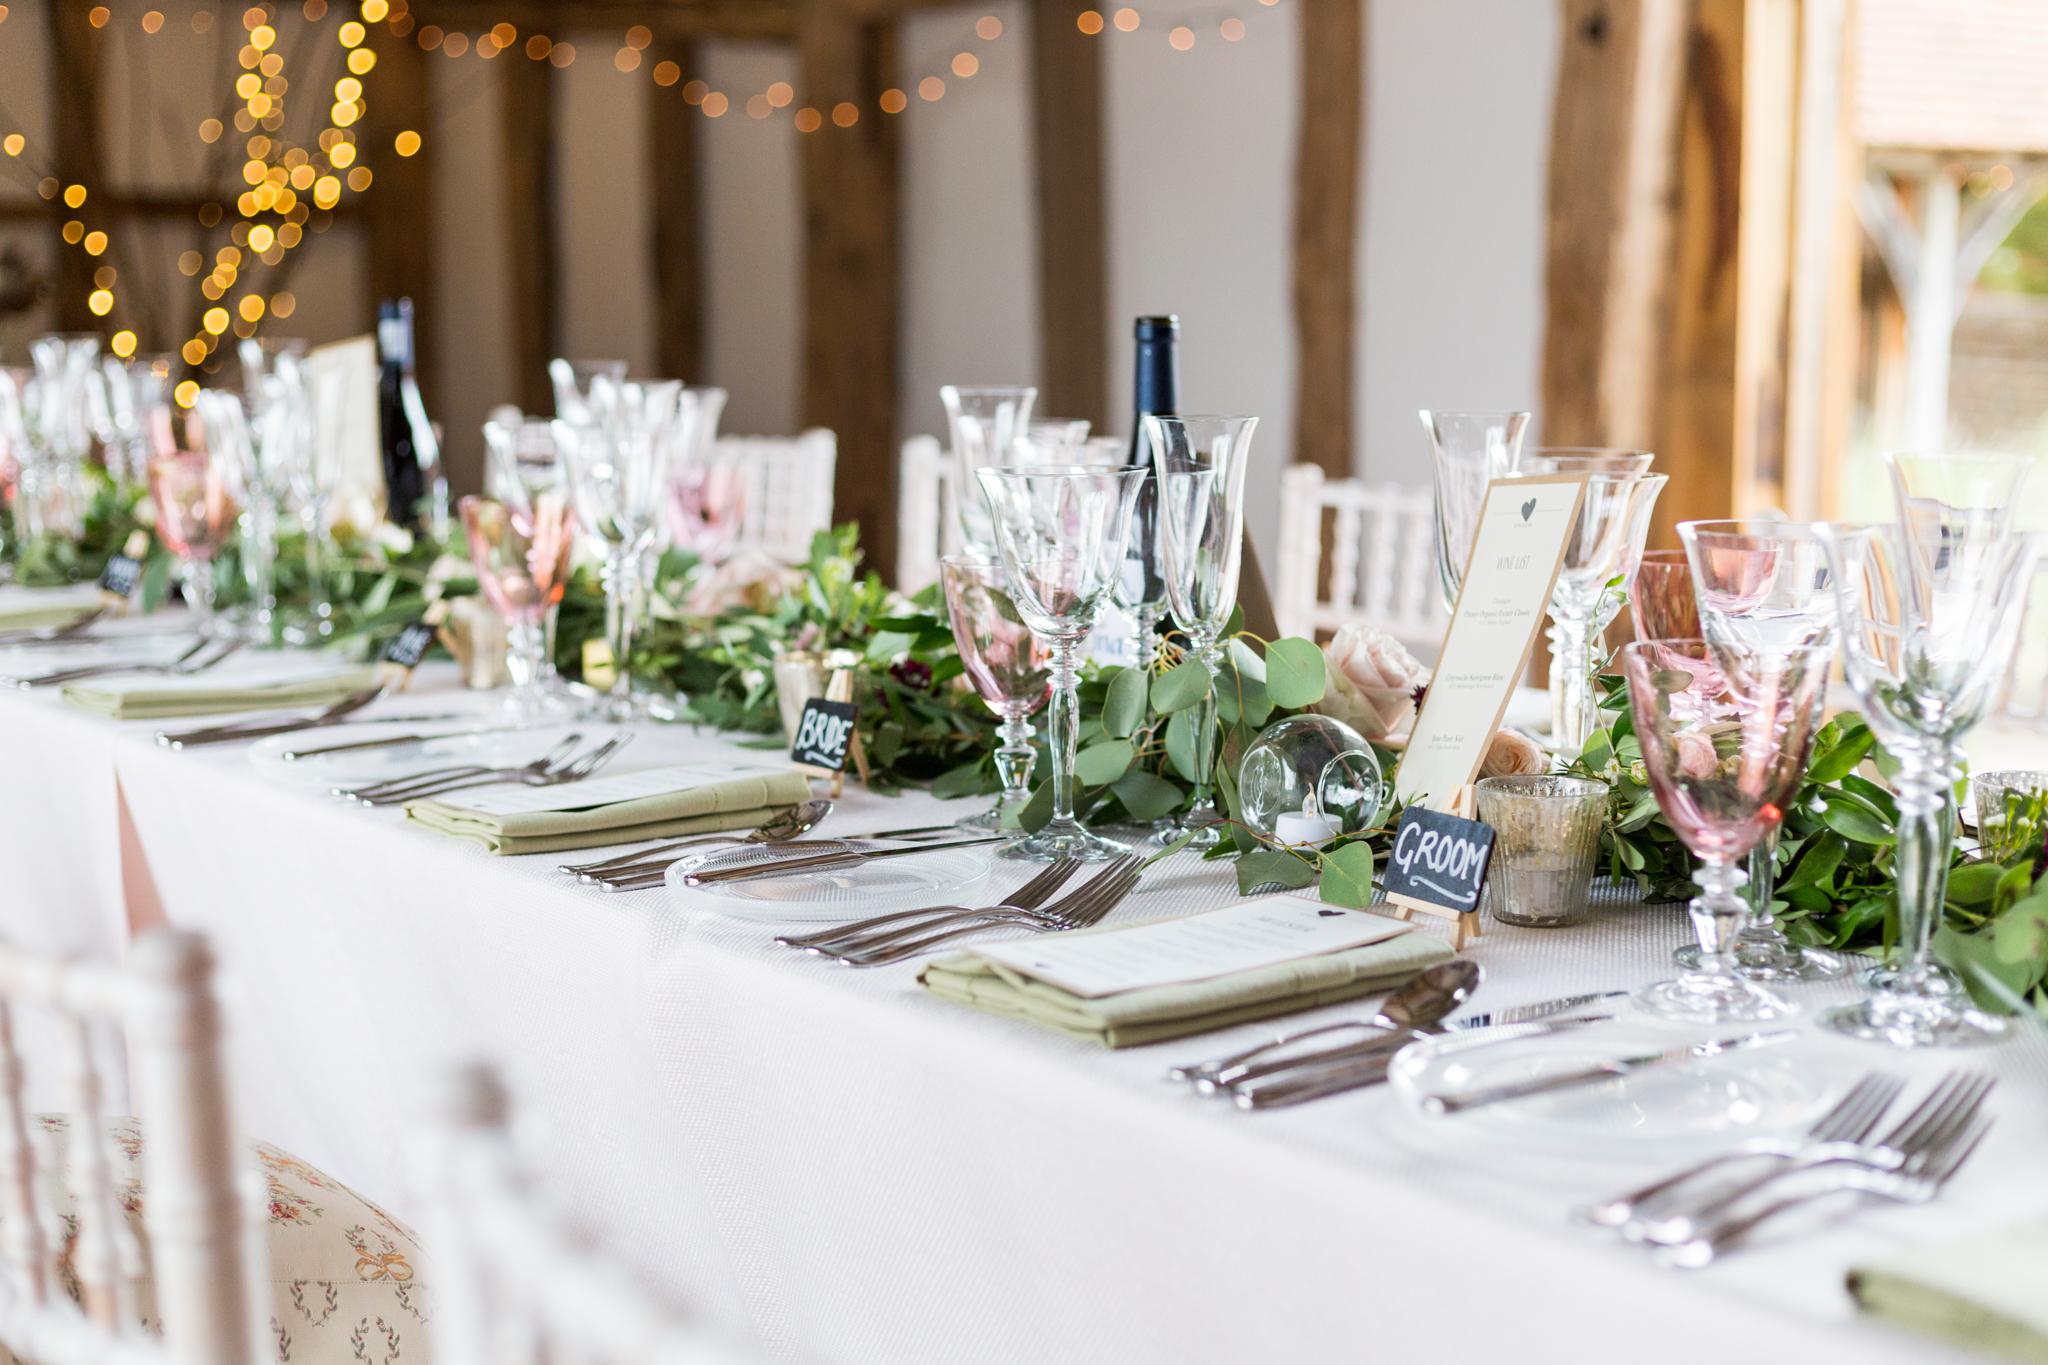 Surrey_Barn_Wedding_Table_prep_fun_natural_wedding_photography_Rachel_Thornhill_Photographer